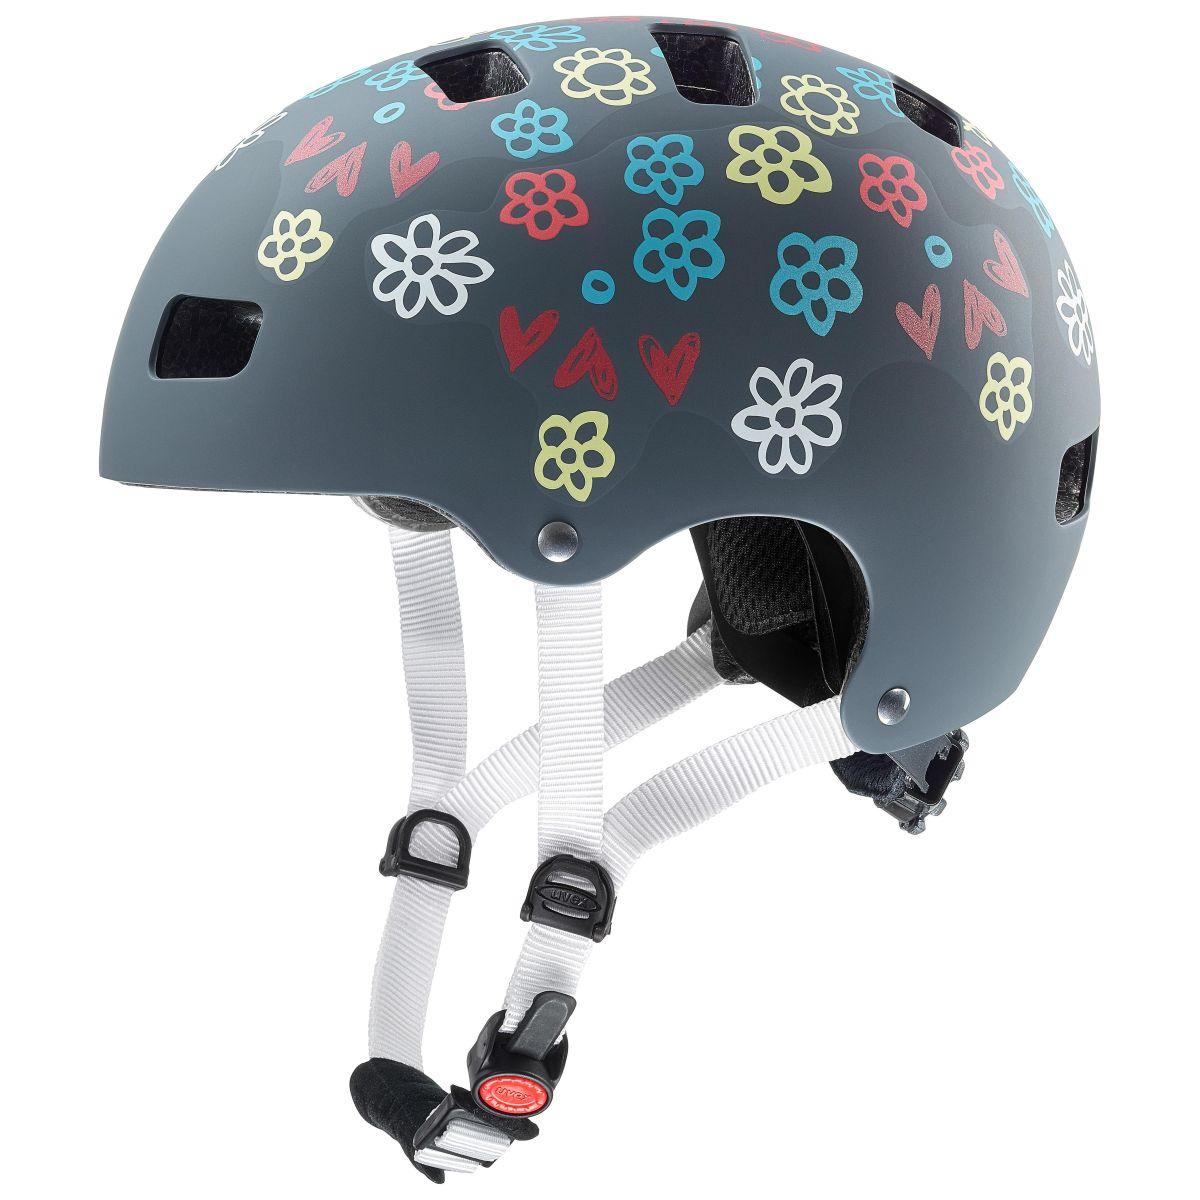 uvex kid 3 cc kinder dirtbike skate fahrrad helm grau 2019 von top marken online kaufen we cycle. Black Bedroom Furniture Sets. Home Design Ideas